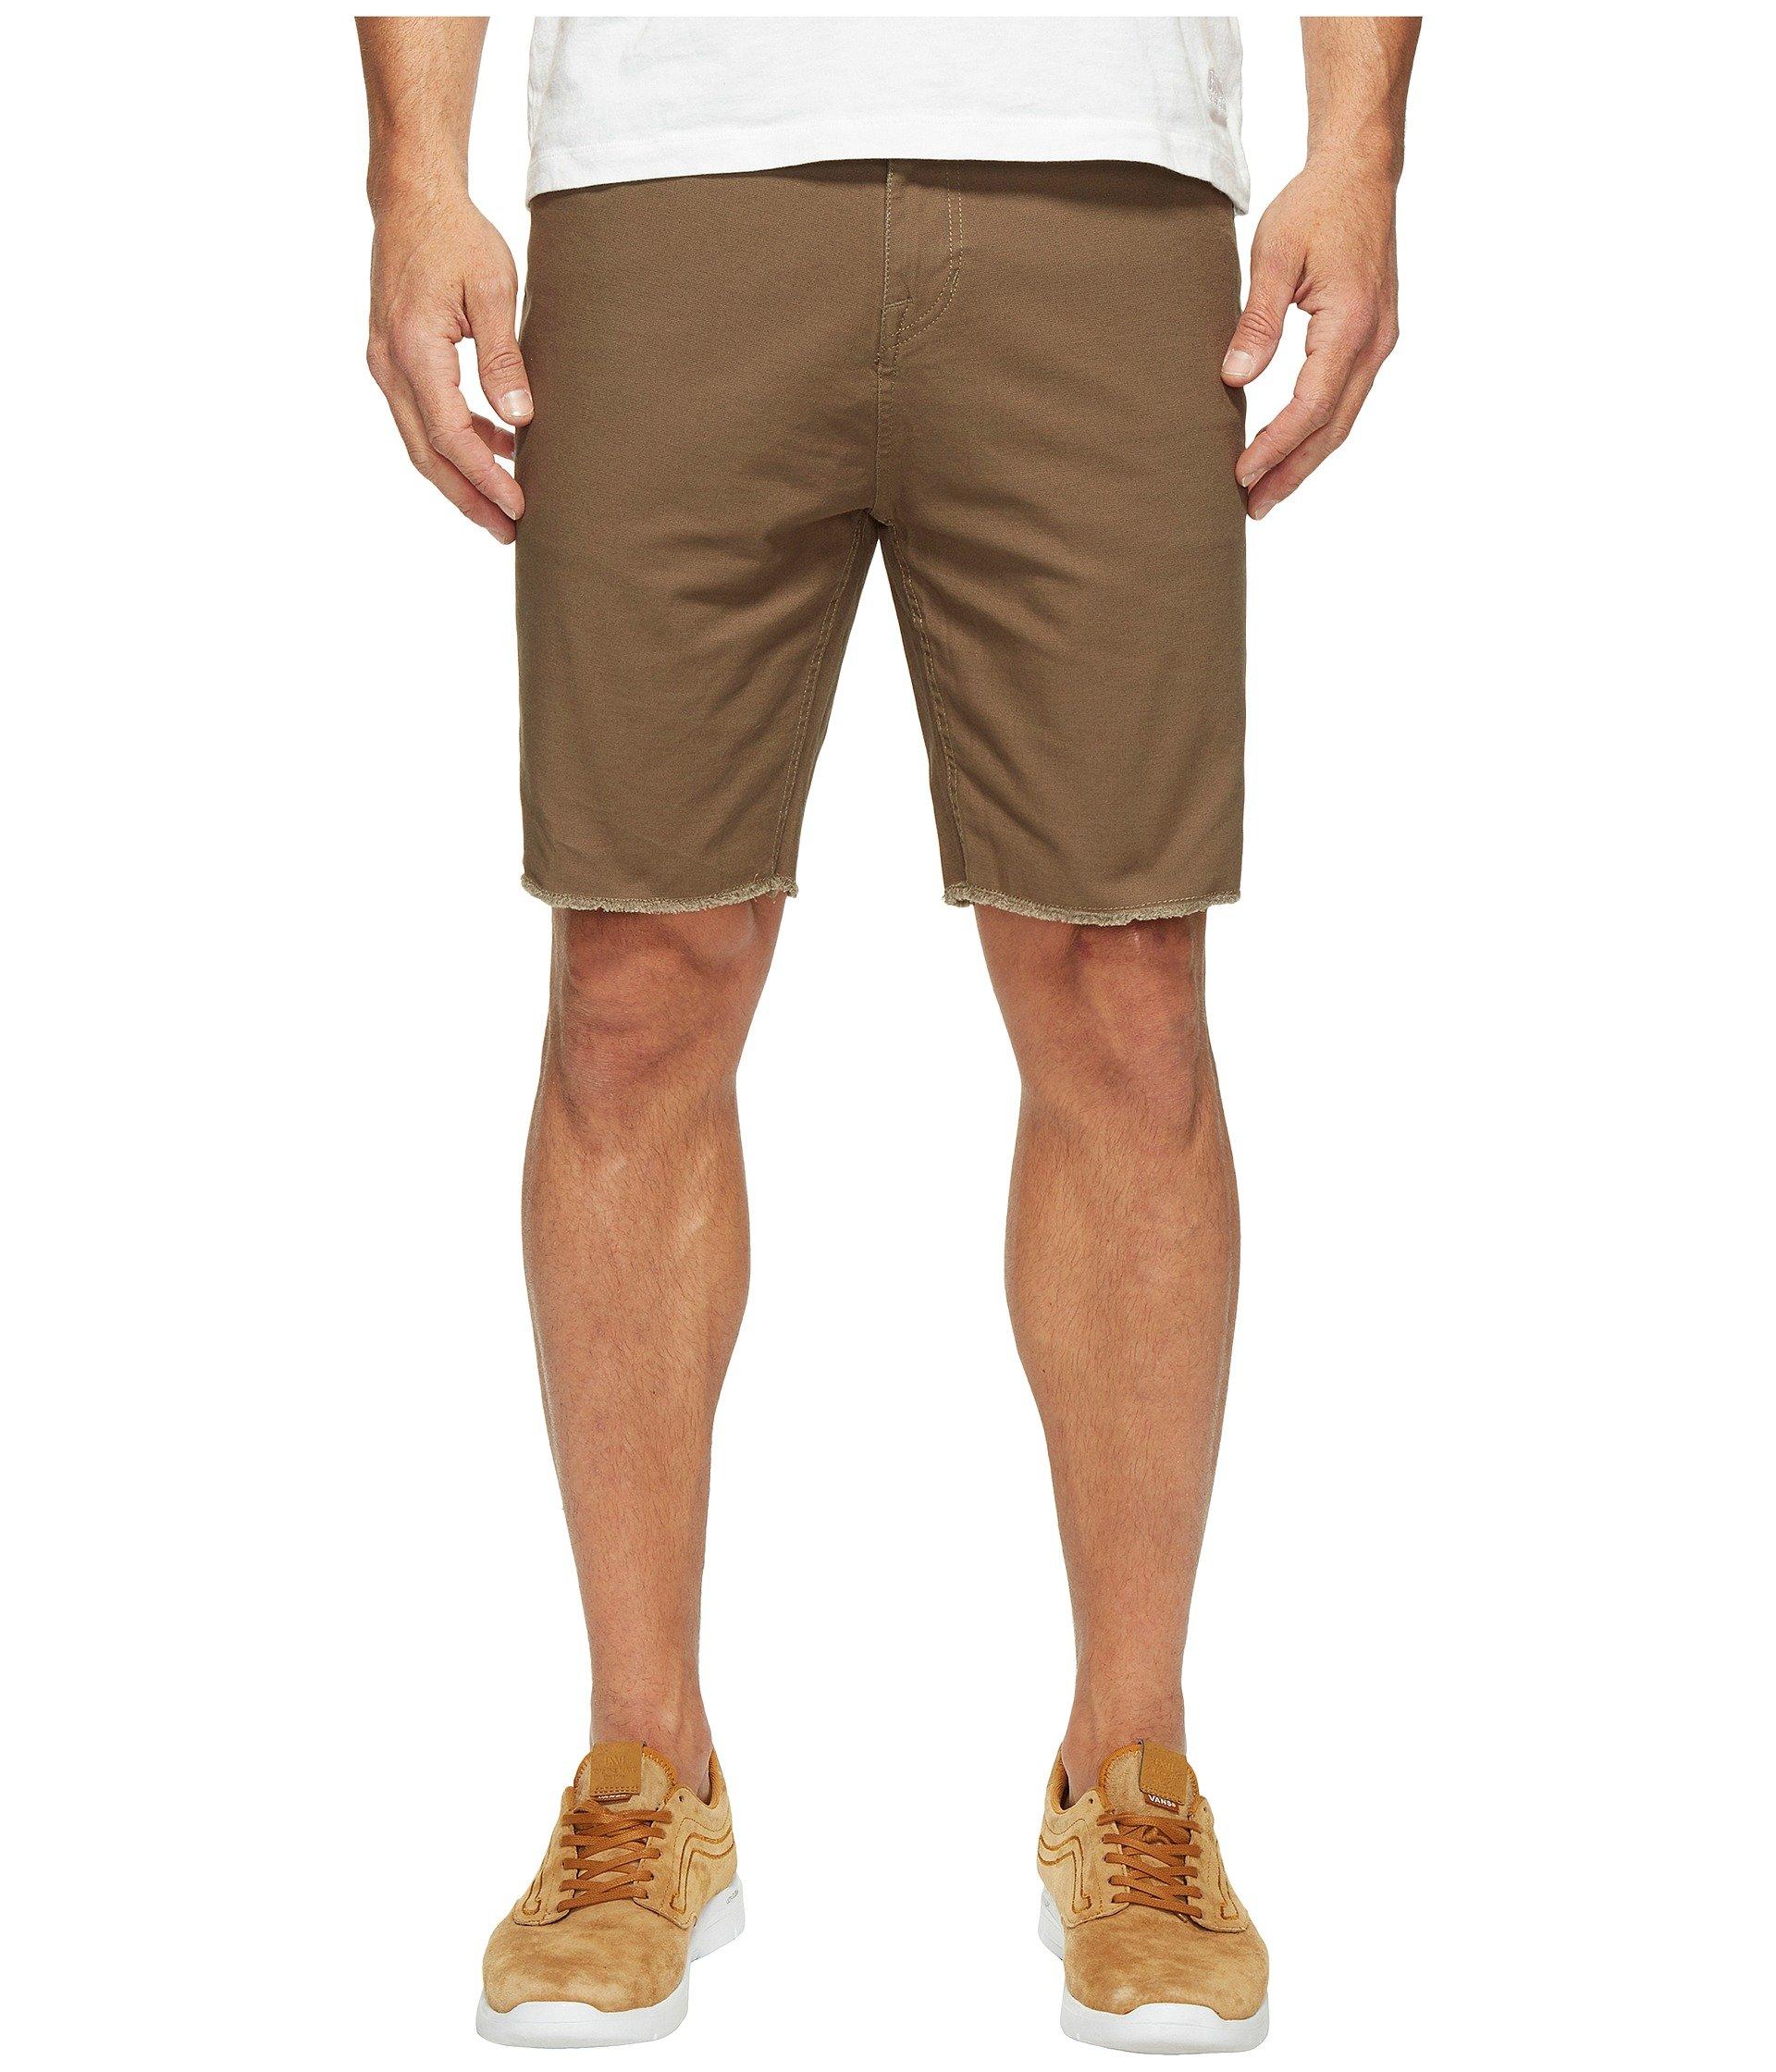 Pantaloneta para Hombre Volcom VSM Atwell Shorts  + Volcom en VeoyCompro.net